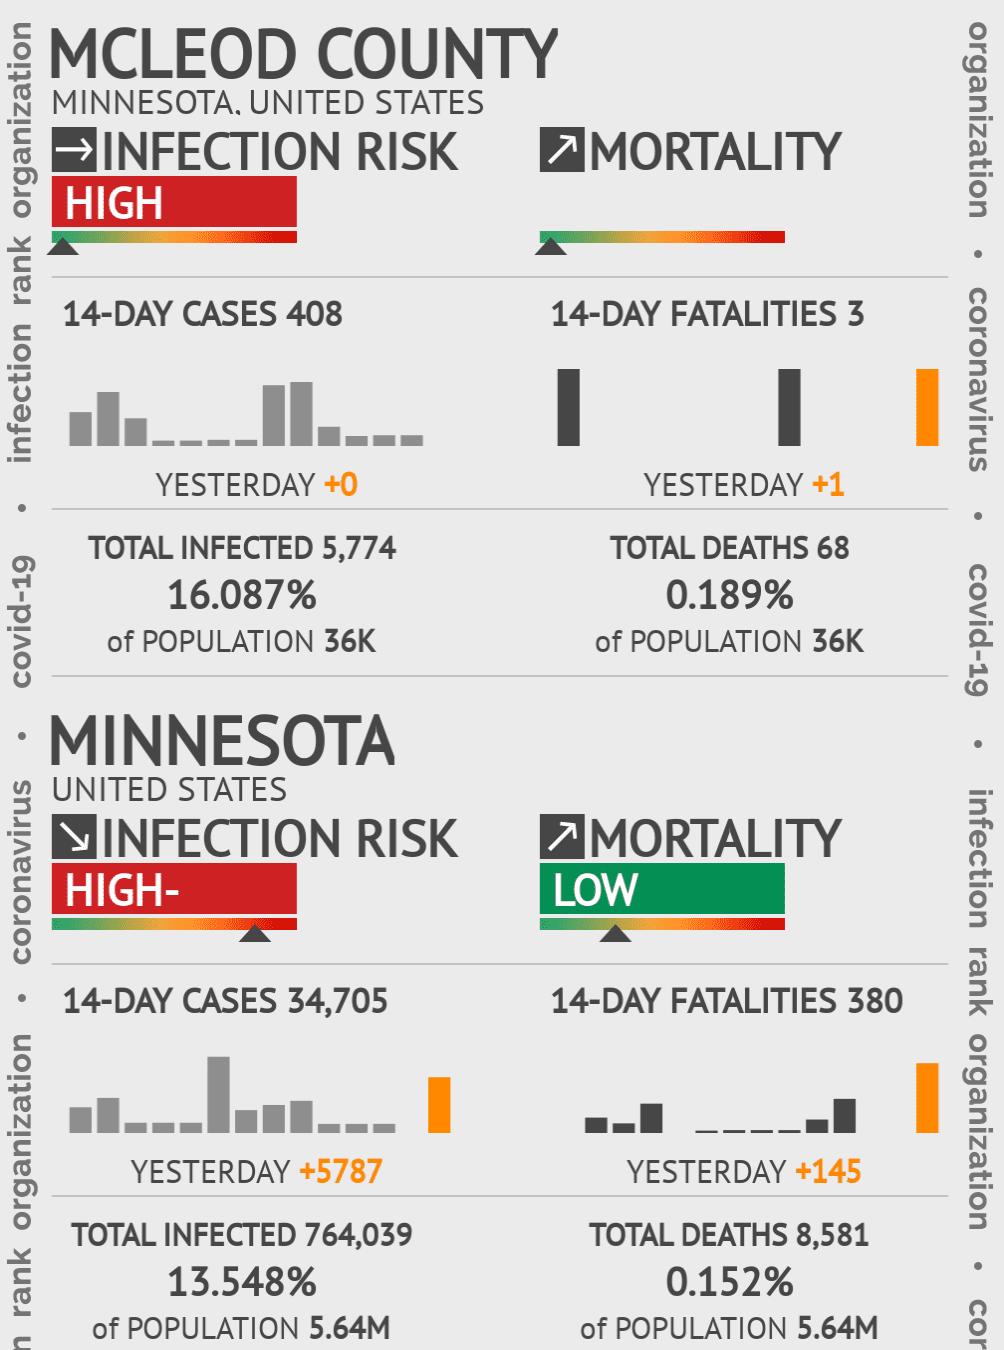 McLeod County Coronavirus Covid-19 Risk of Infection on July 24, 2021